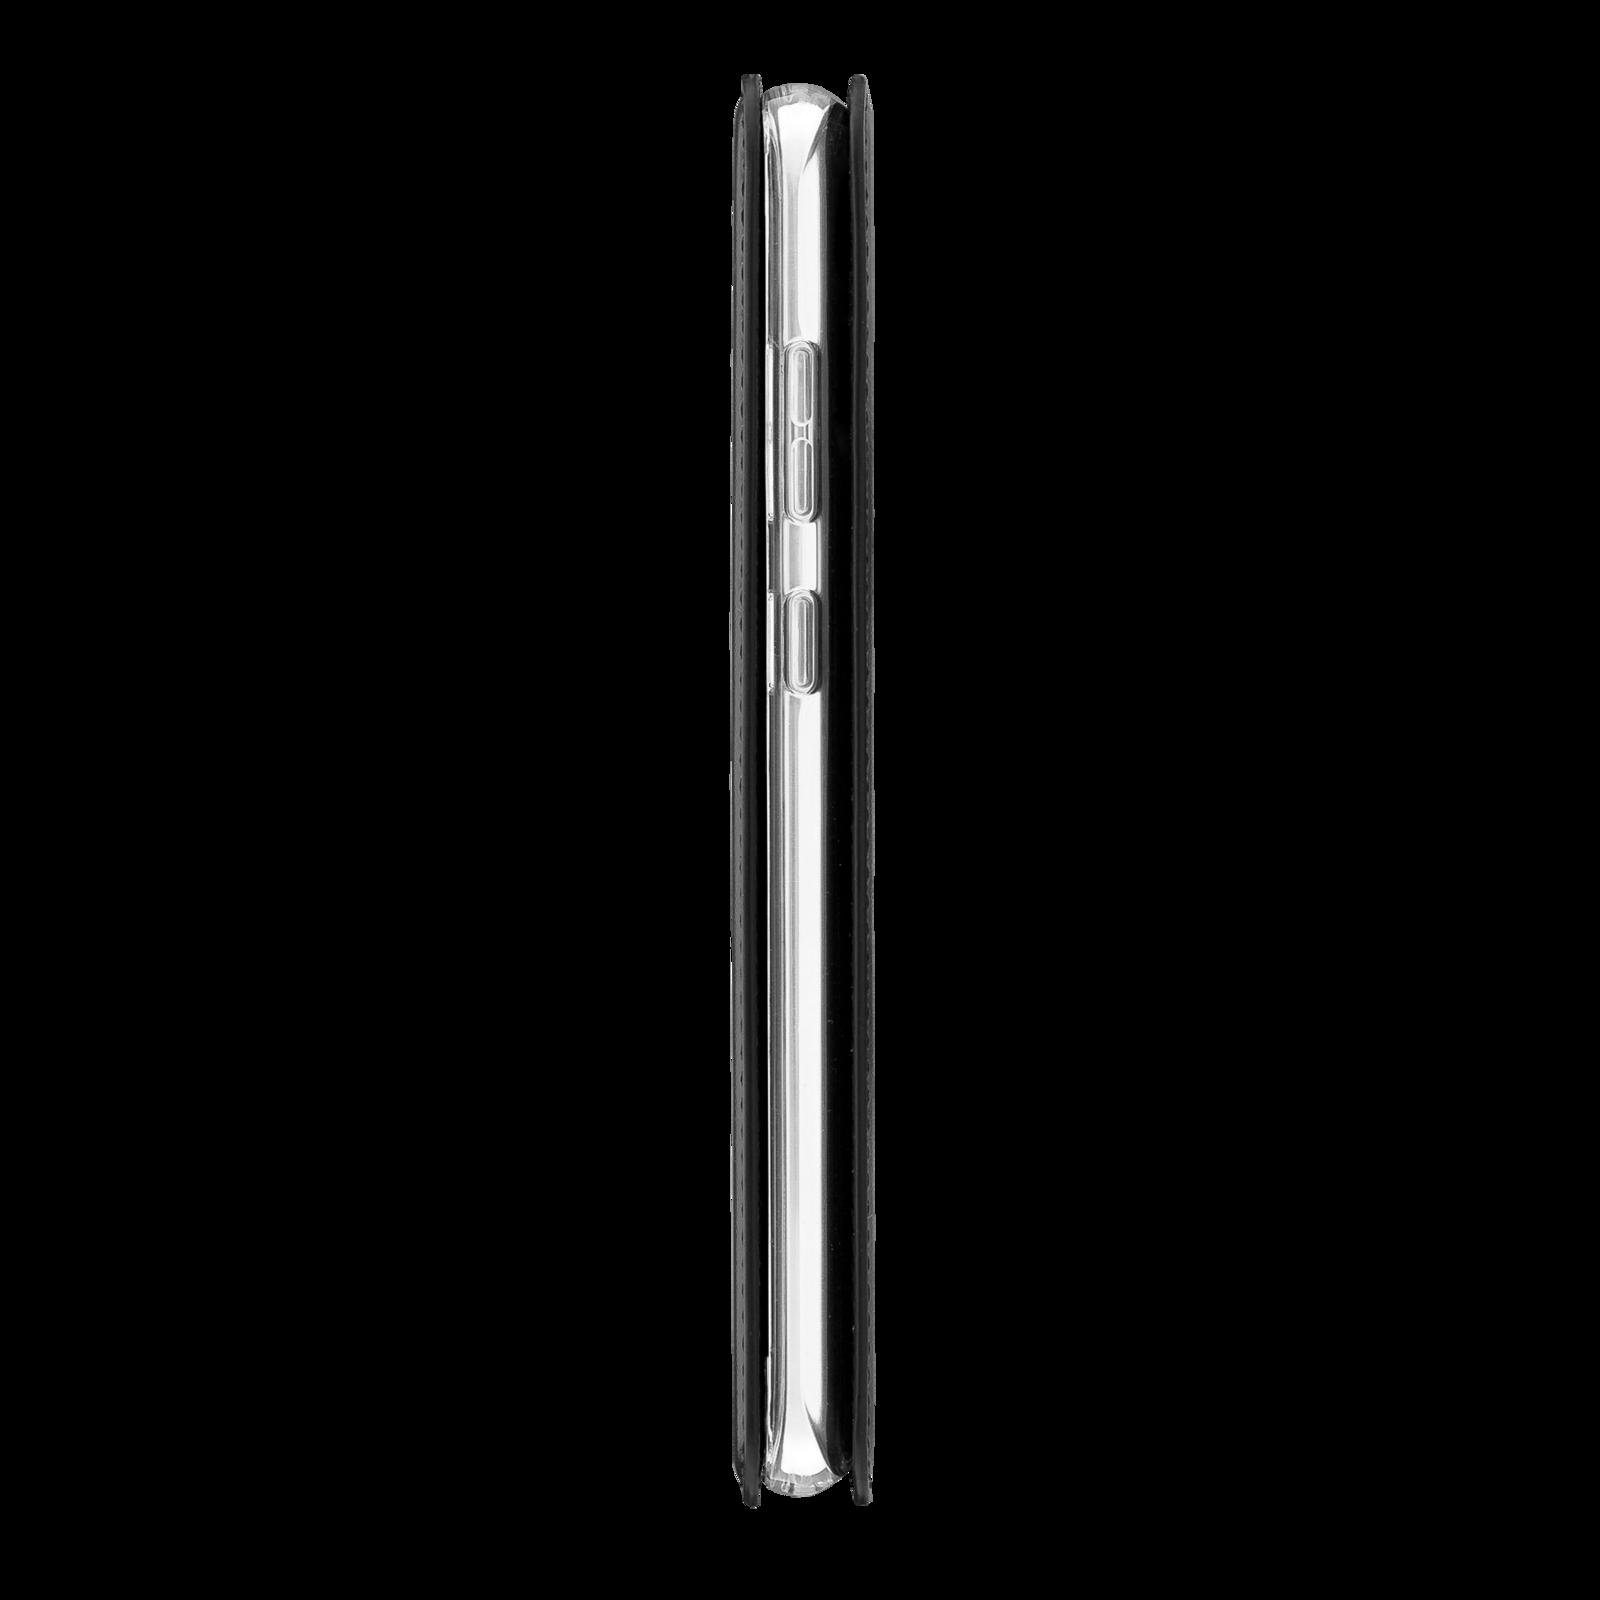 3SIXT: SlimFolio 2.0 for Samsung Galaxy S20+ image